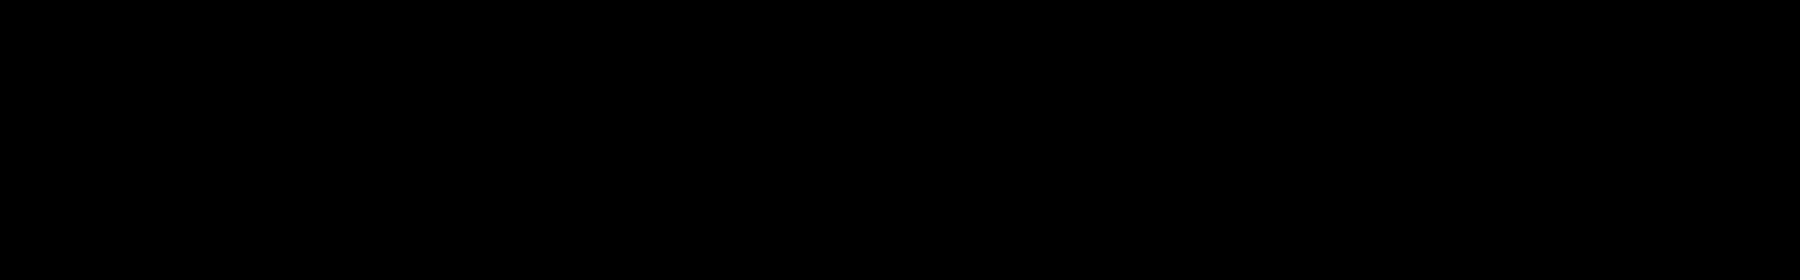 Uzi Green audio waveform